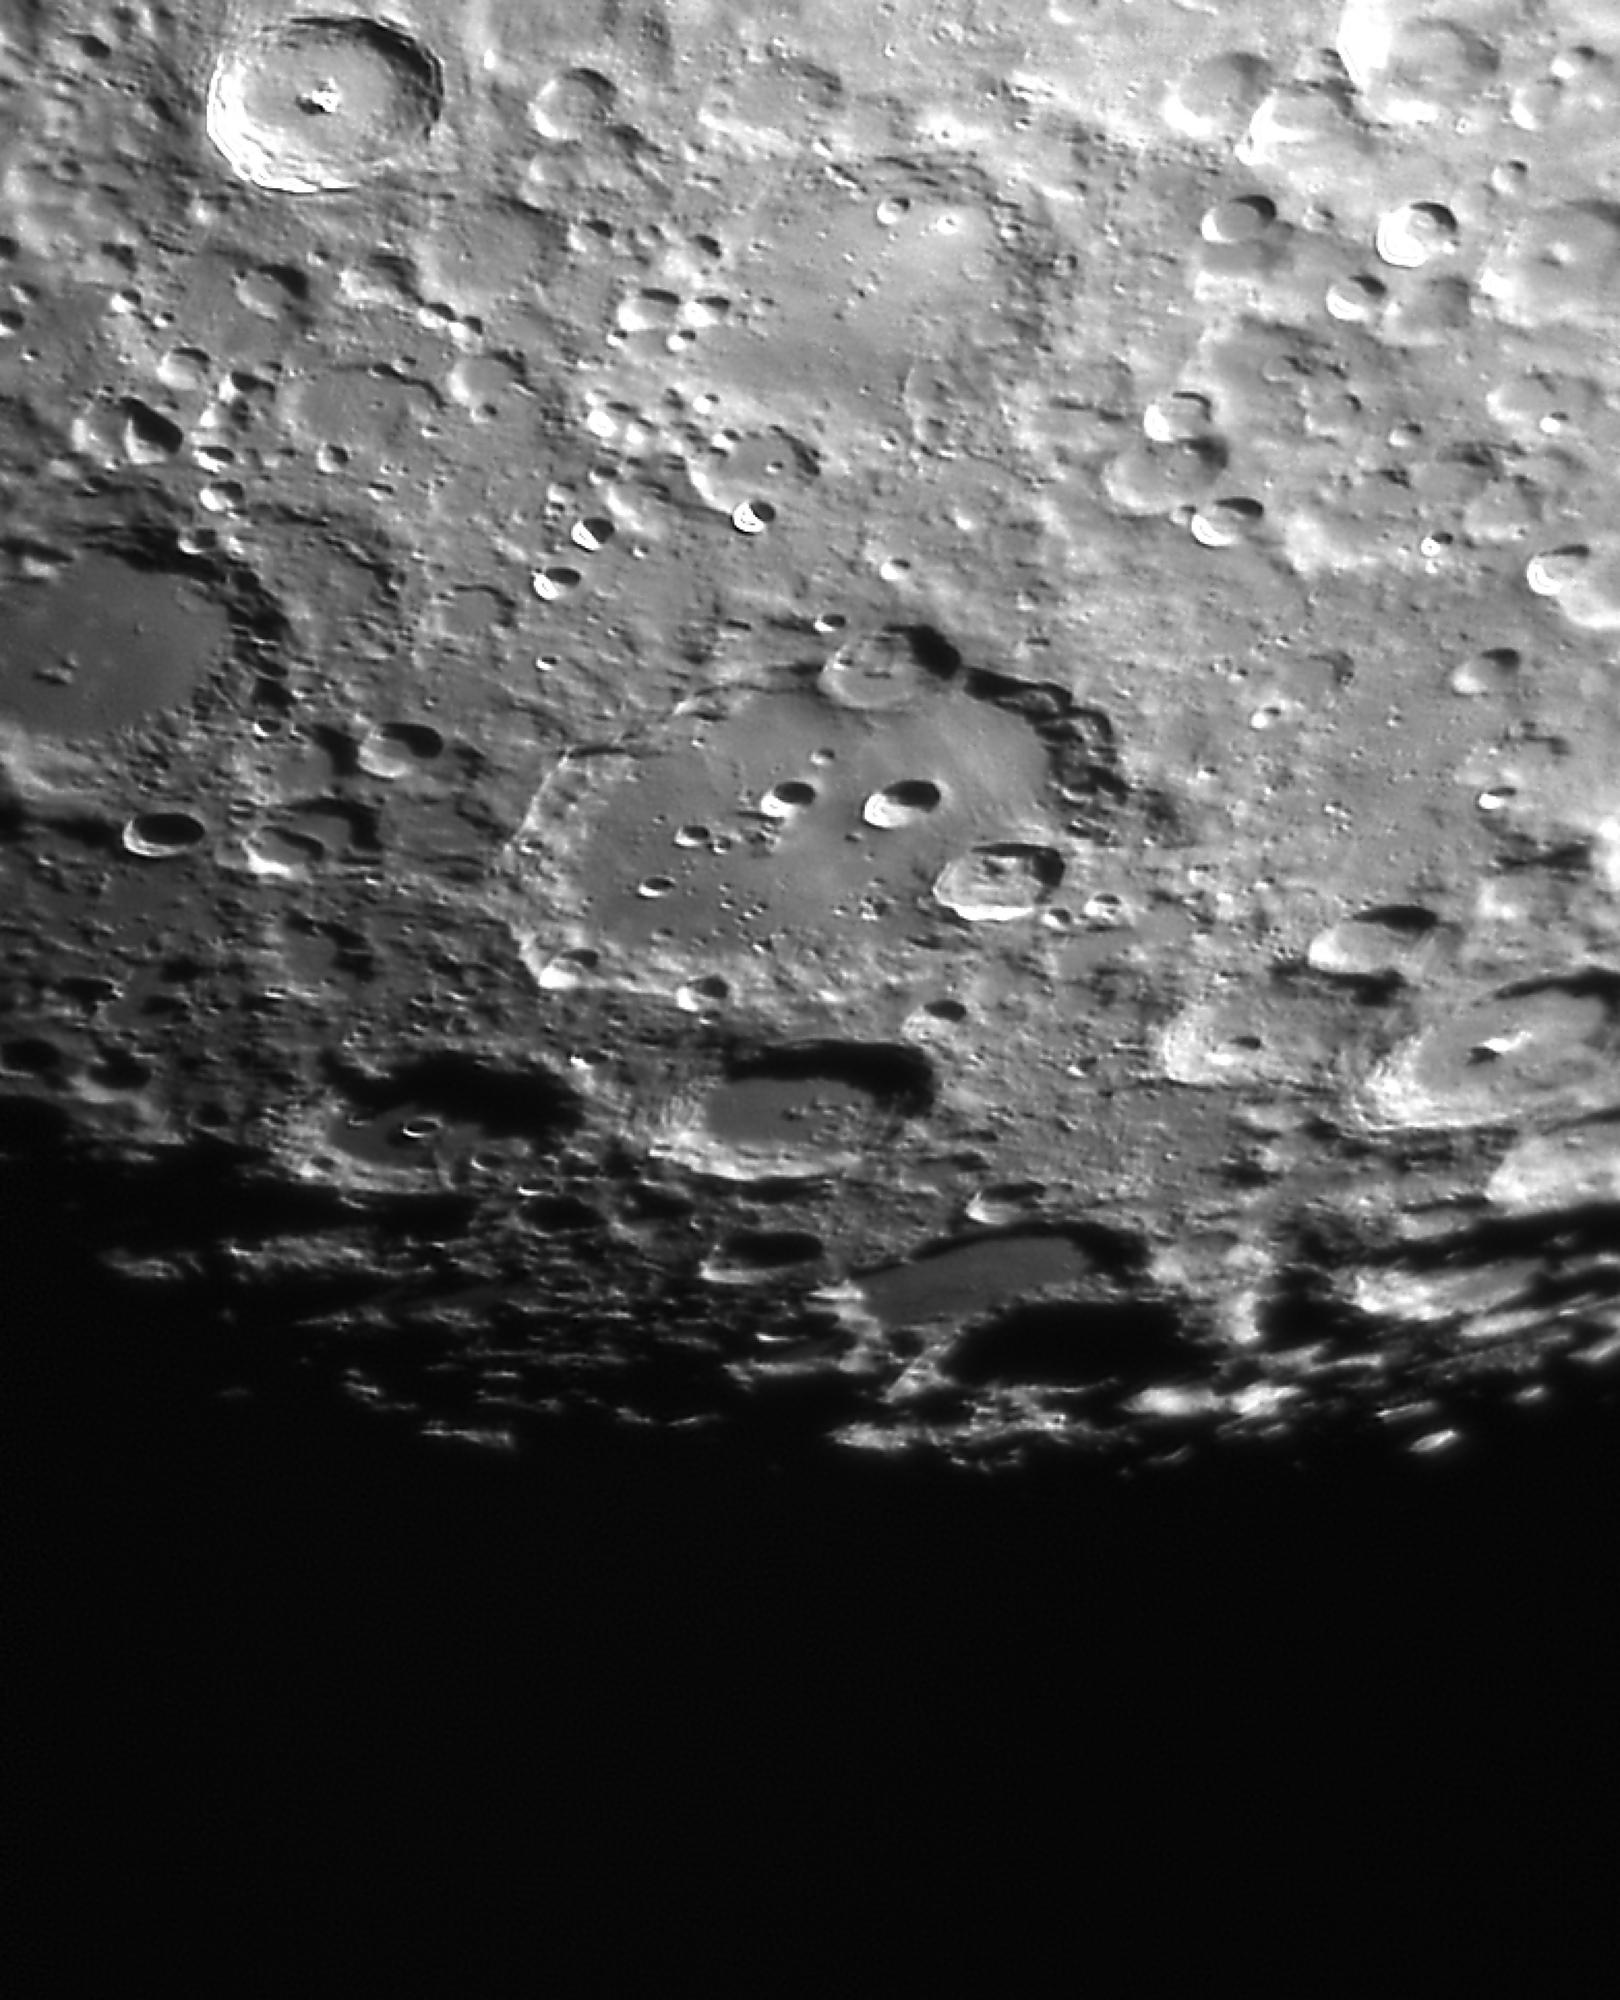 Moon_211103_Clavius.jpg